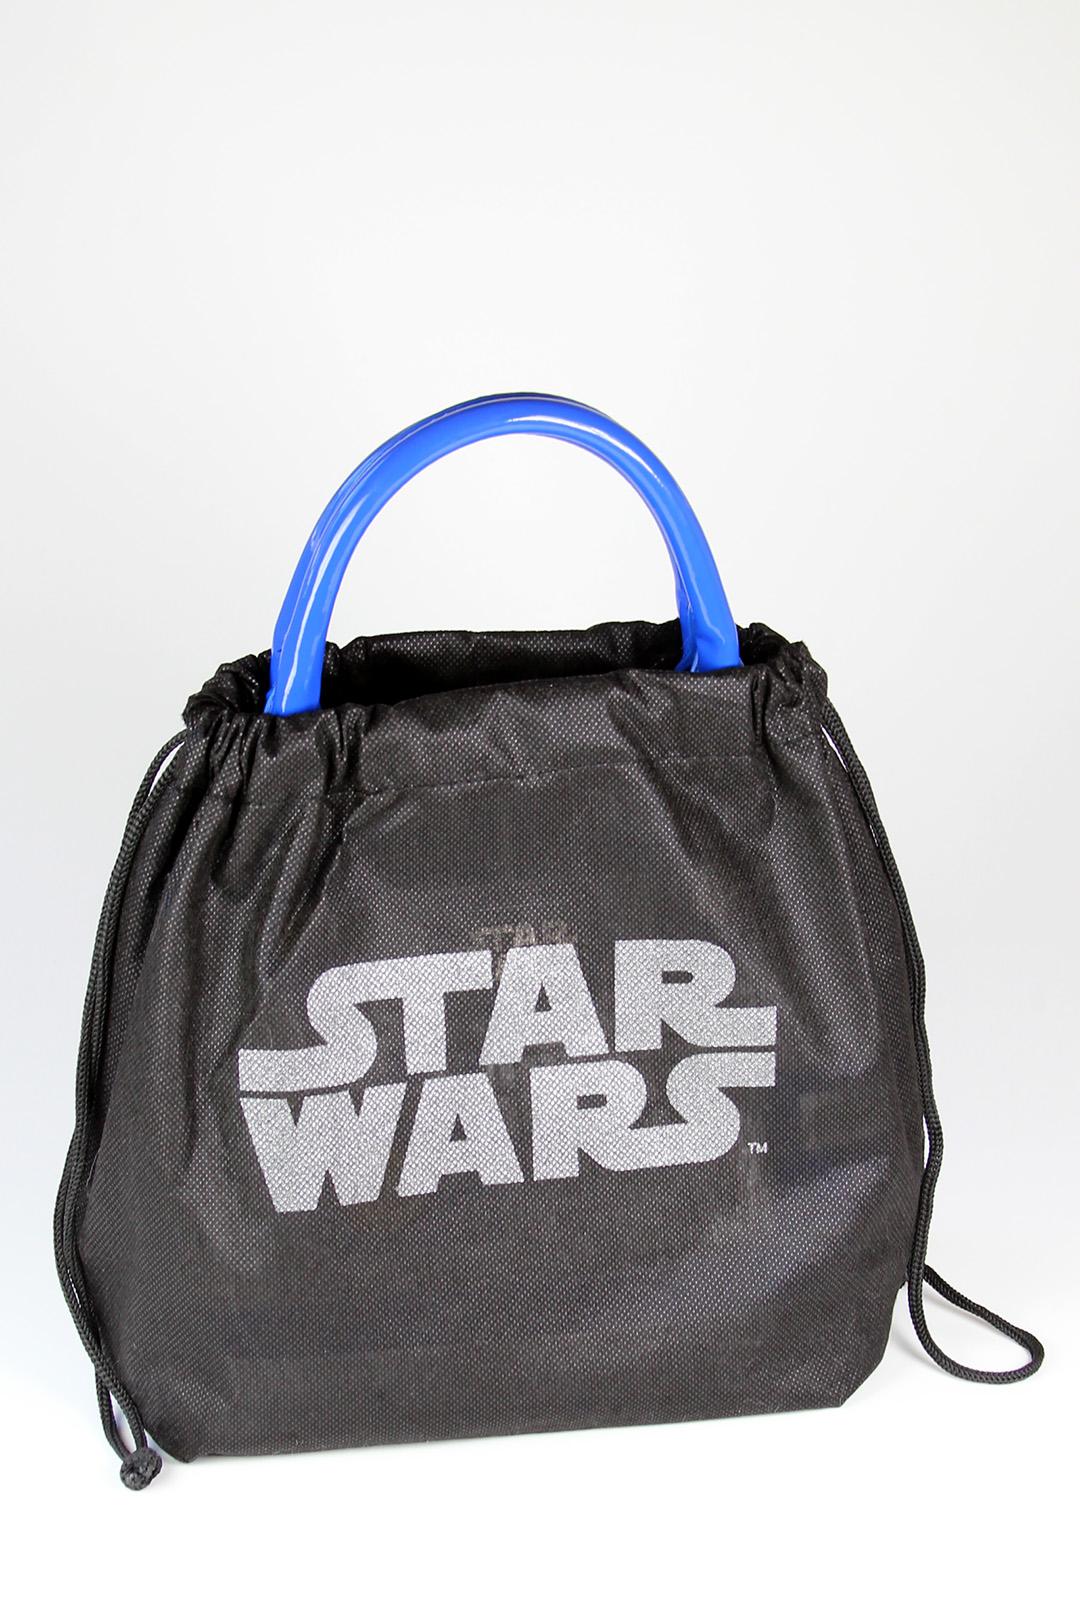 Loungefly - R2-D2 handbag in dust bag